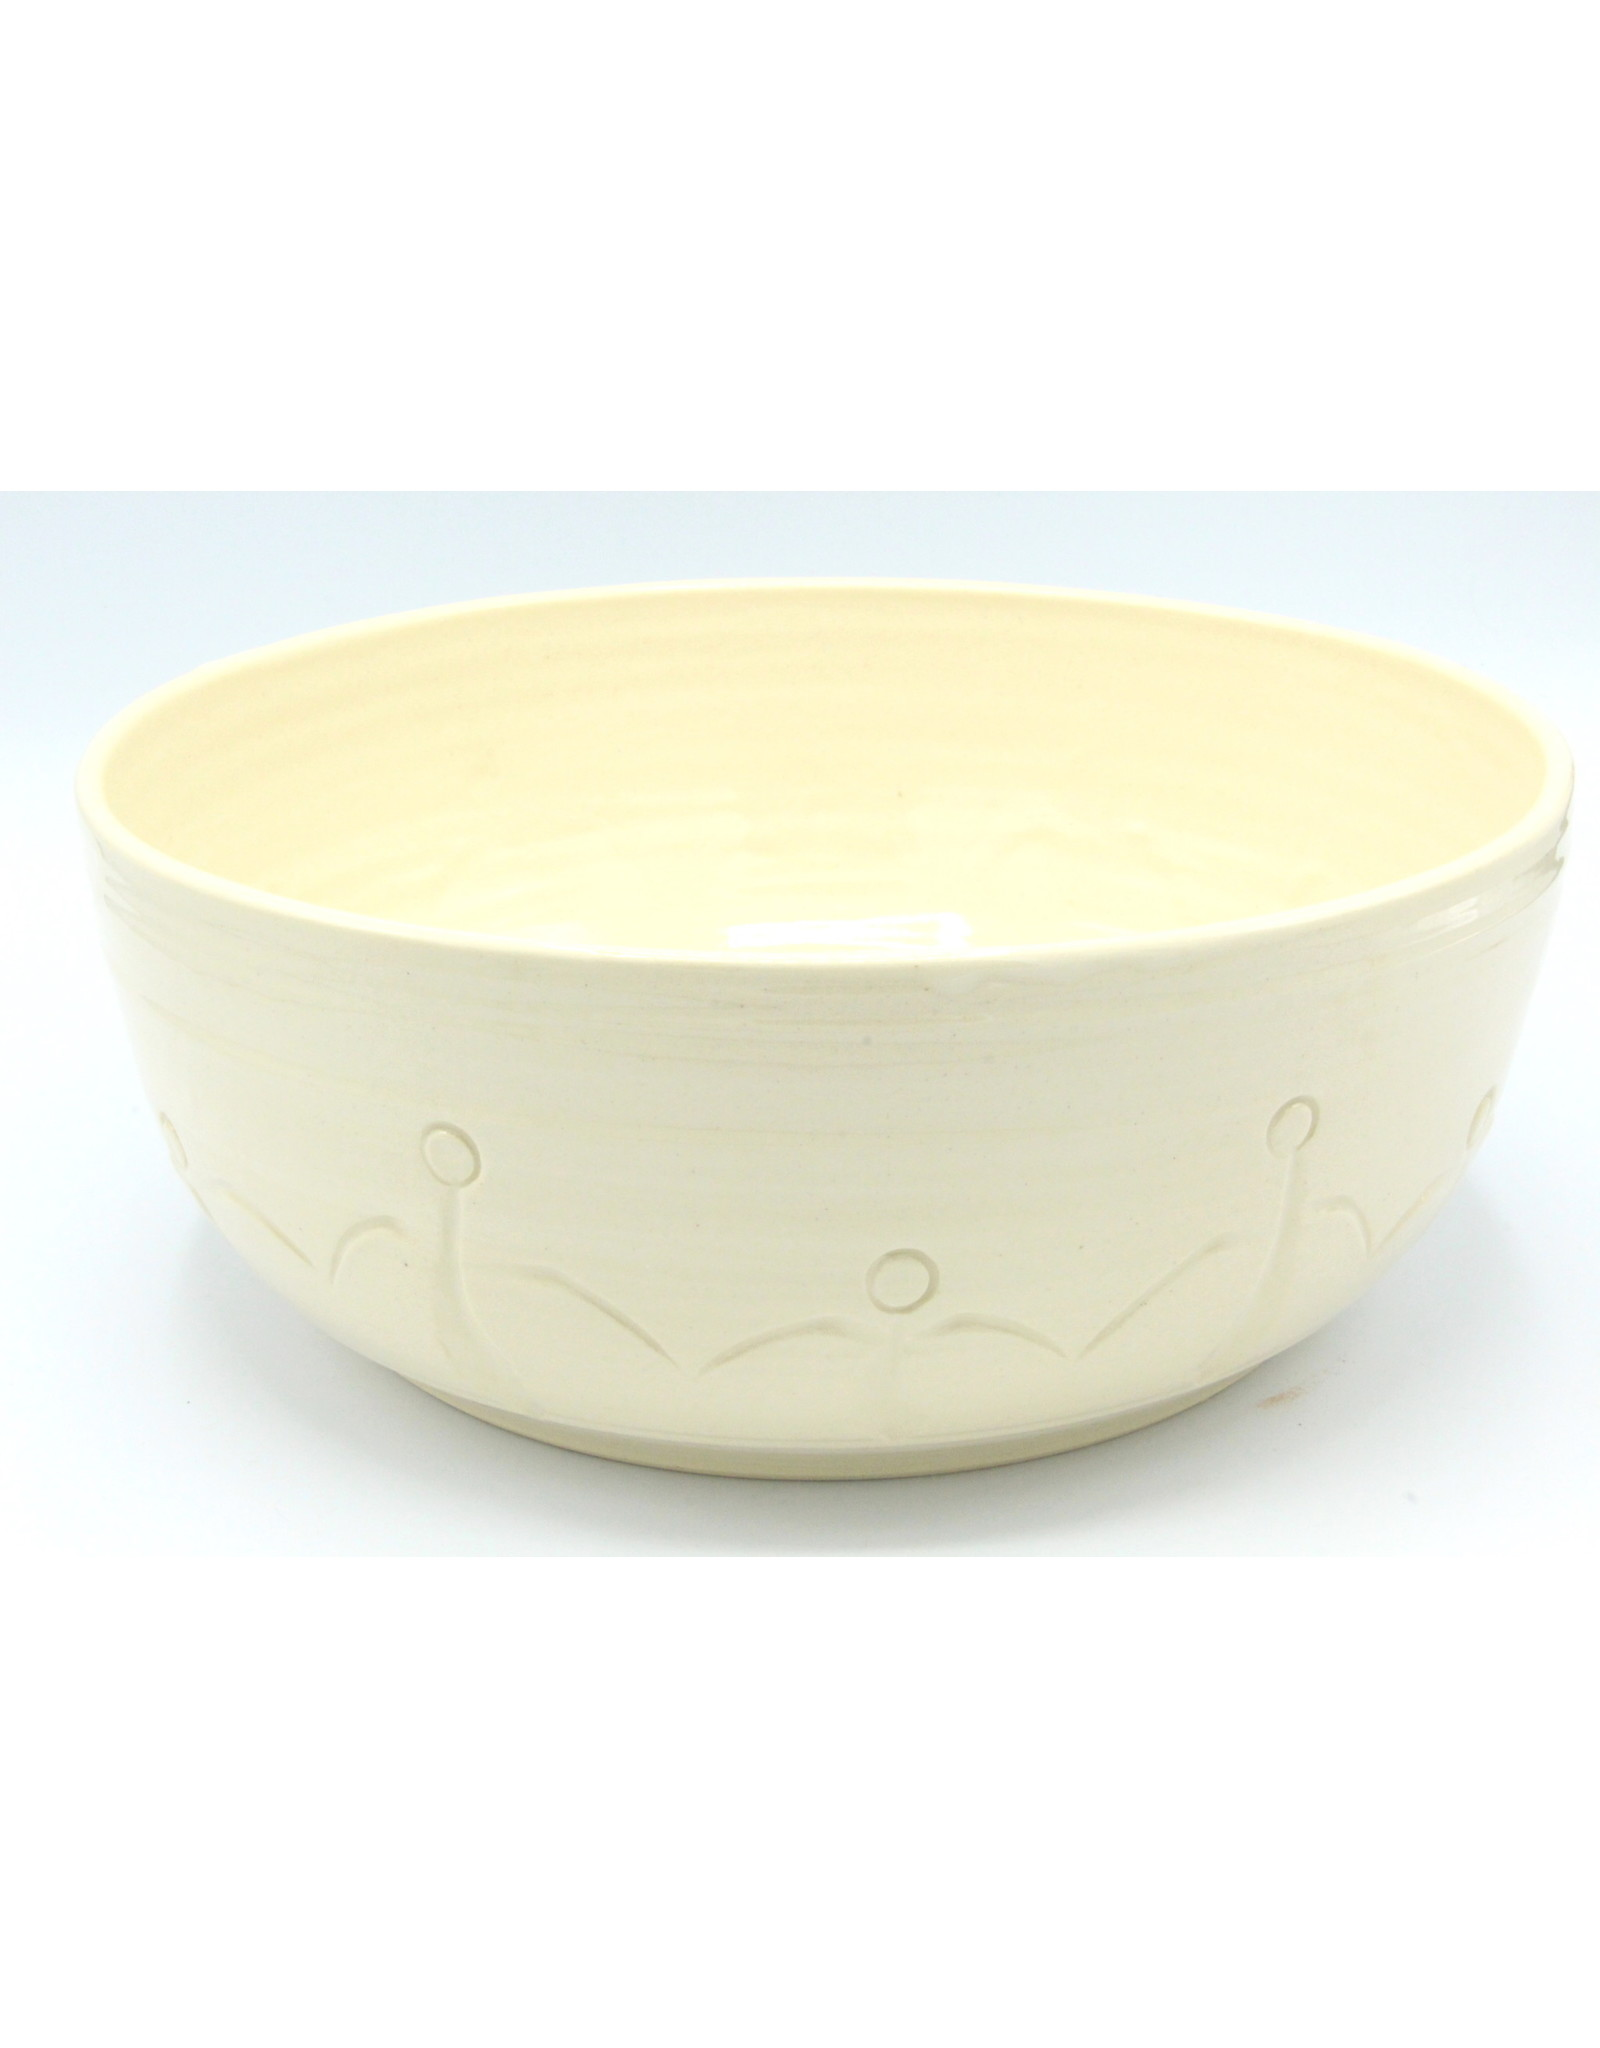 XL Friendship Bowl